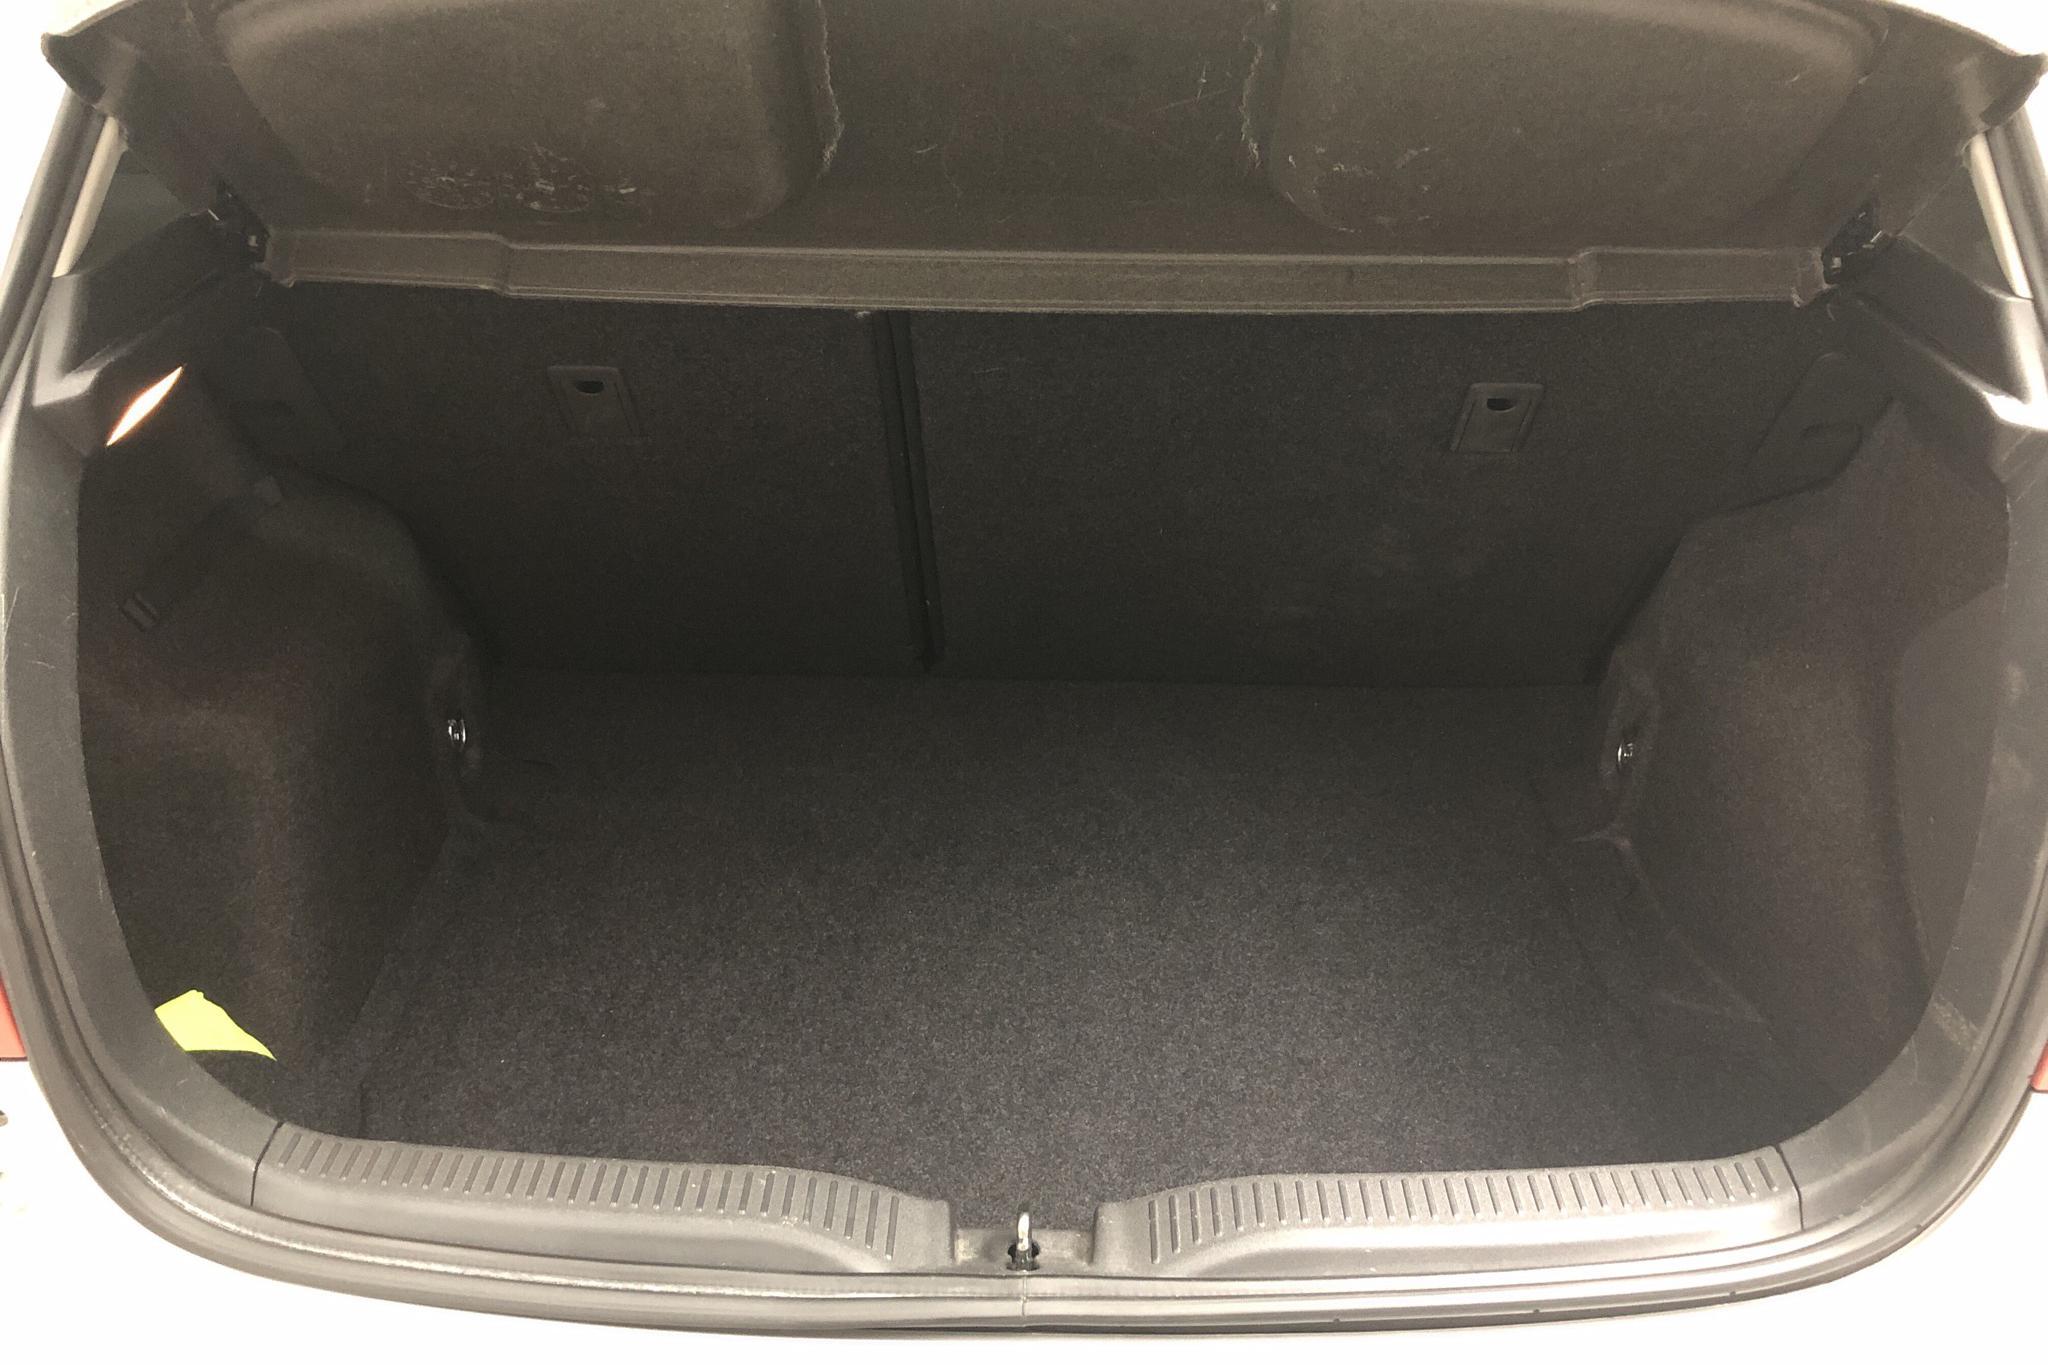 Toyota Auris 1.6 VVT-i 5dr (132hk) - 4 387 mil - Manuell - silver - 2012